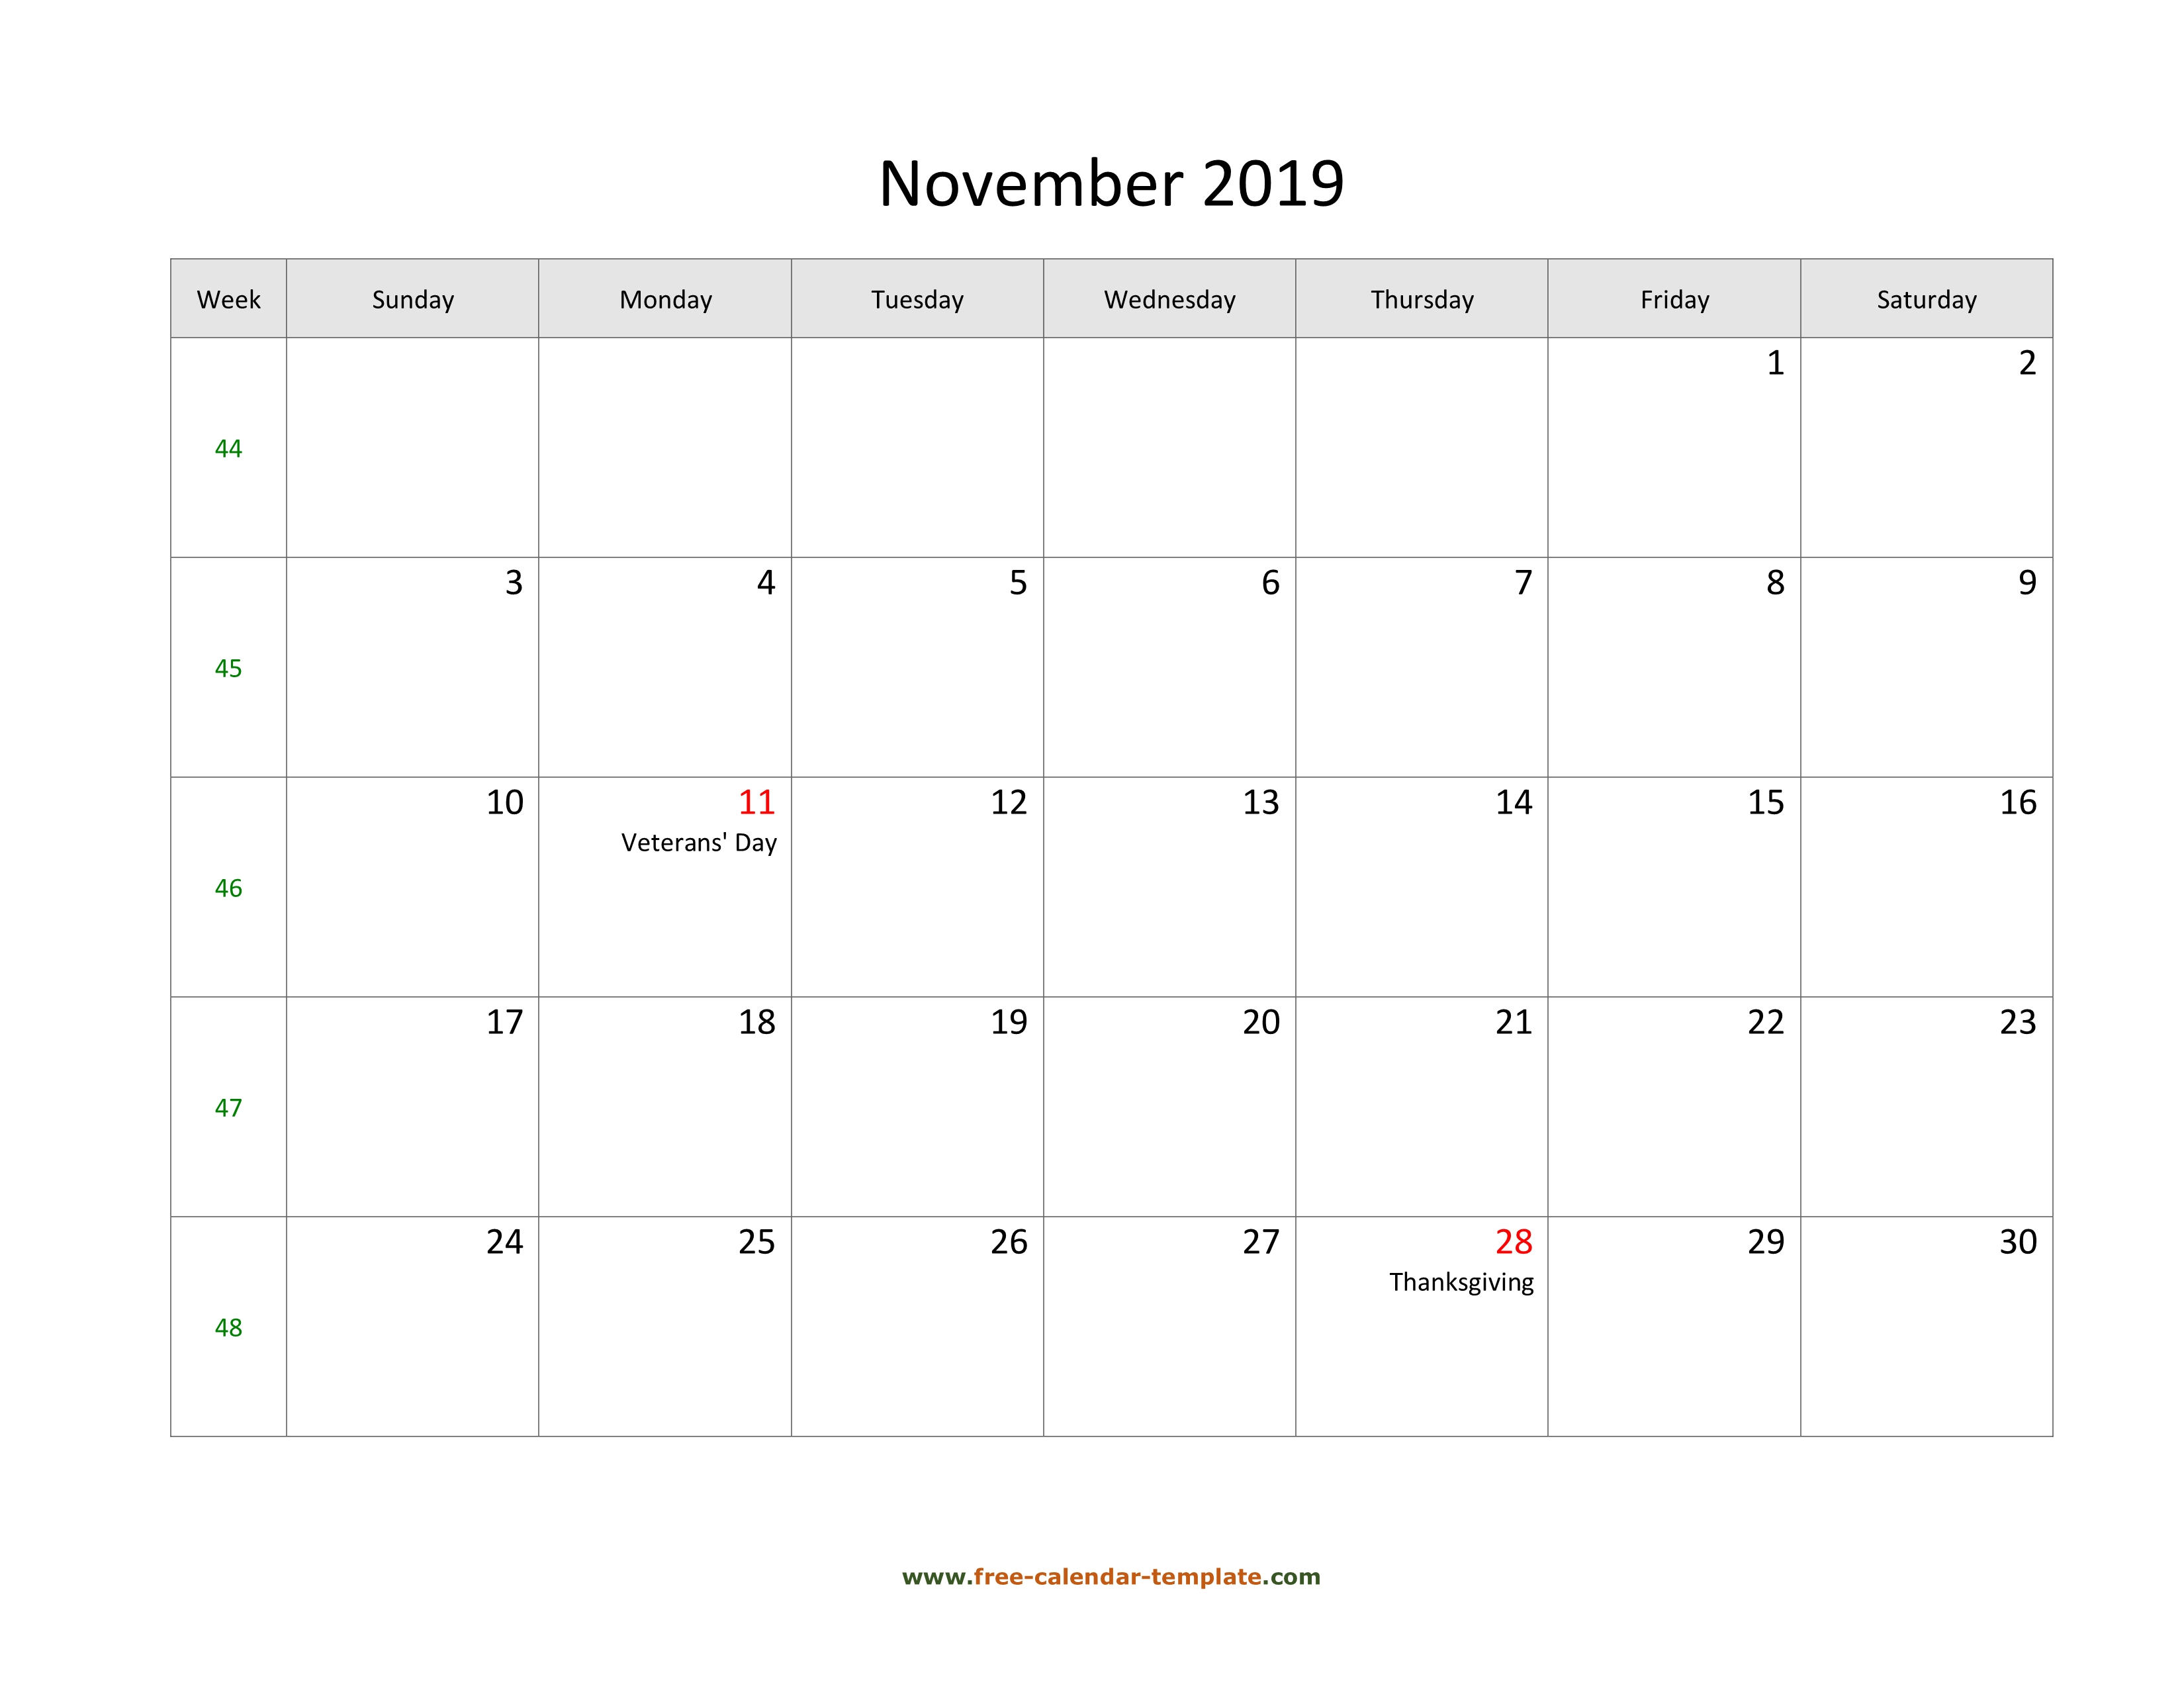 November 2019 Free Calendar Tempplate | Freecalendar throughout Calendar With Large Squares